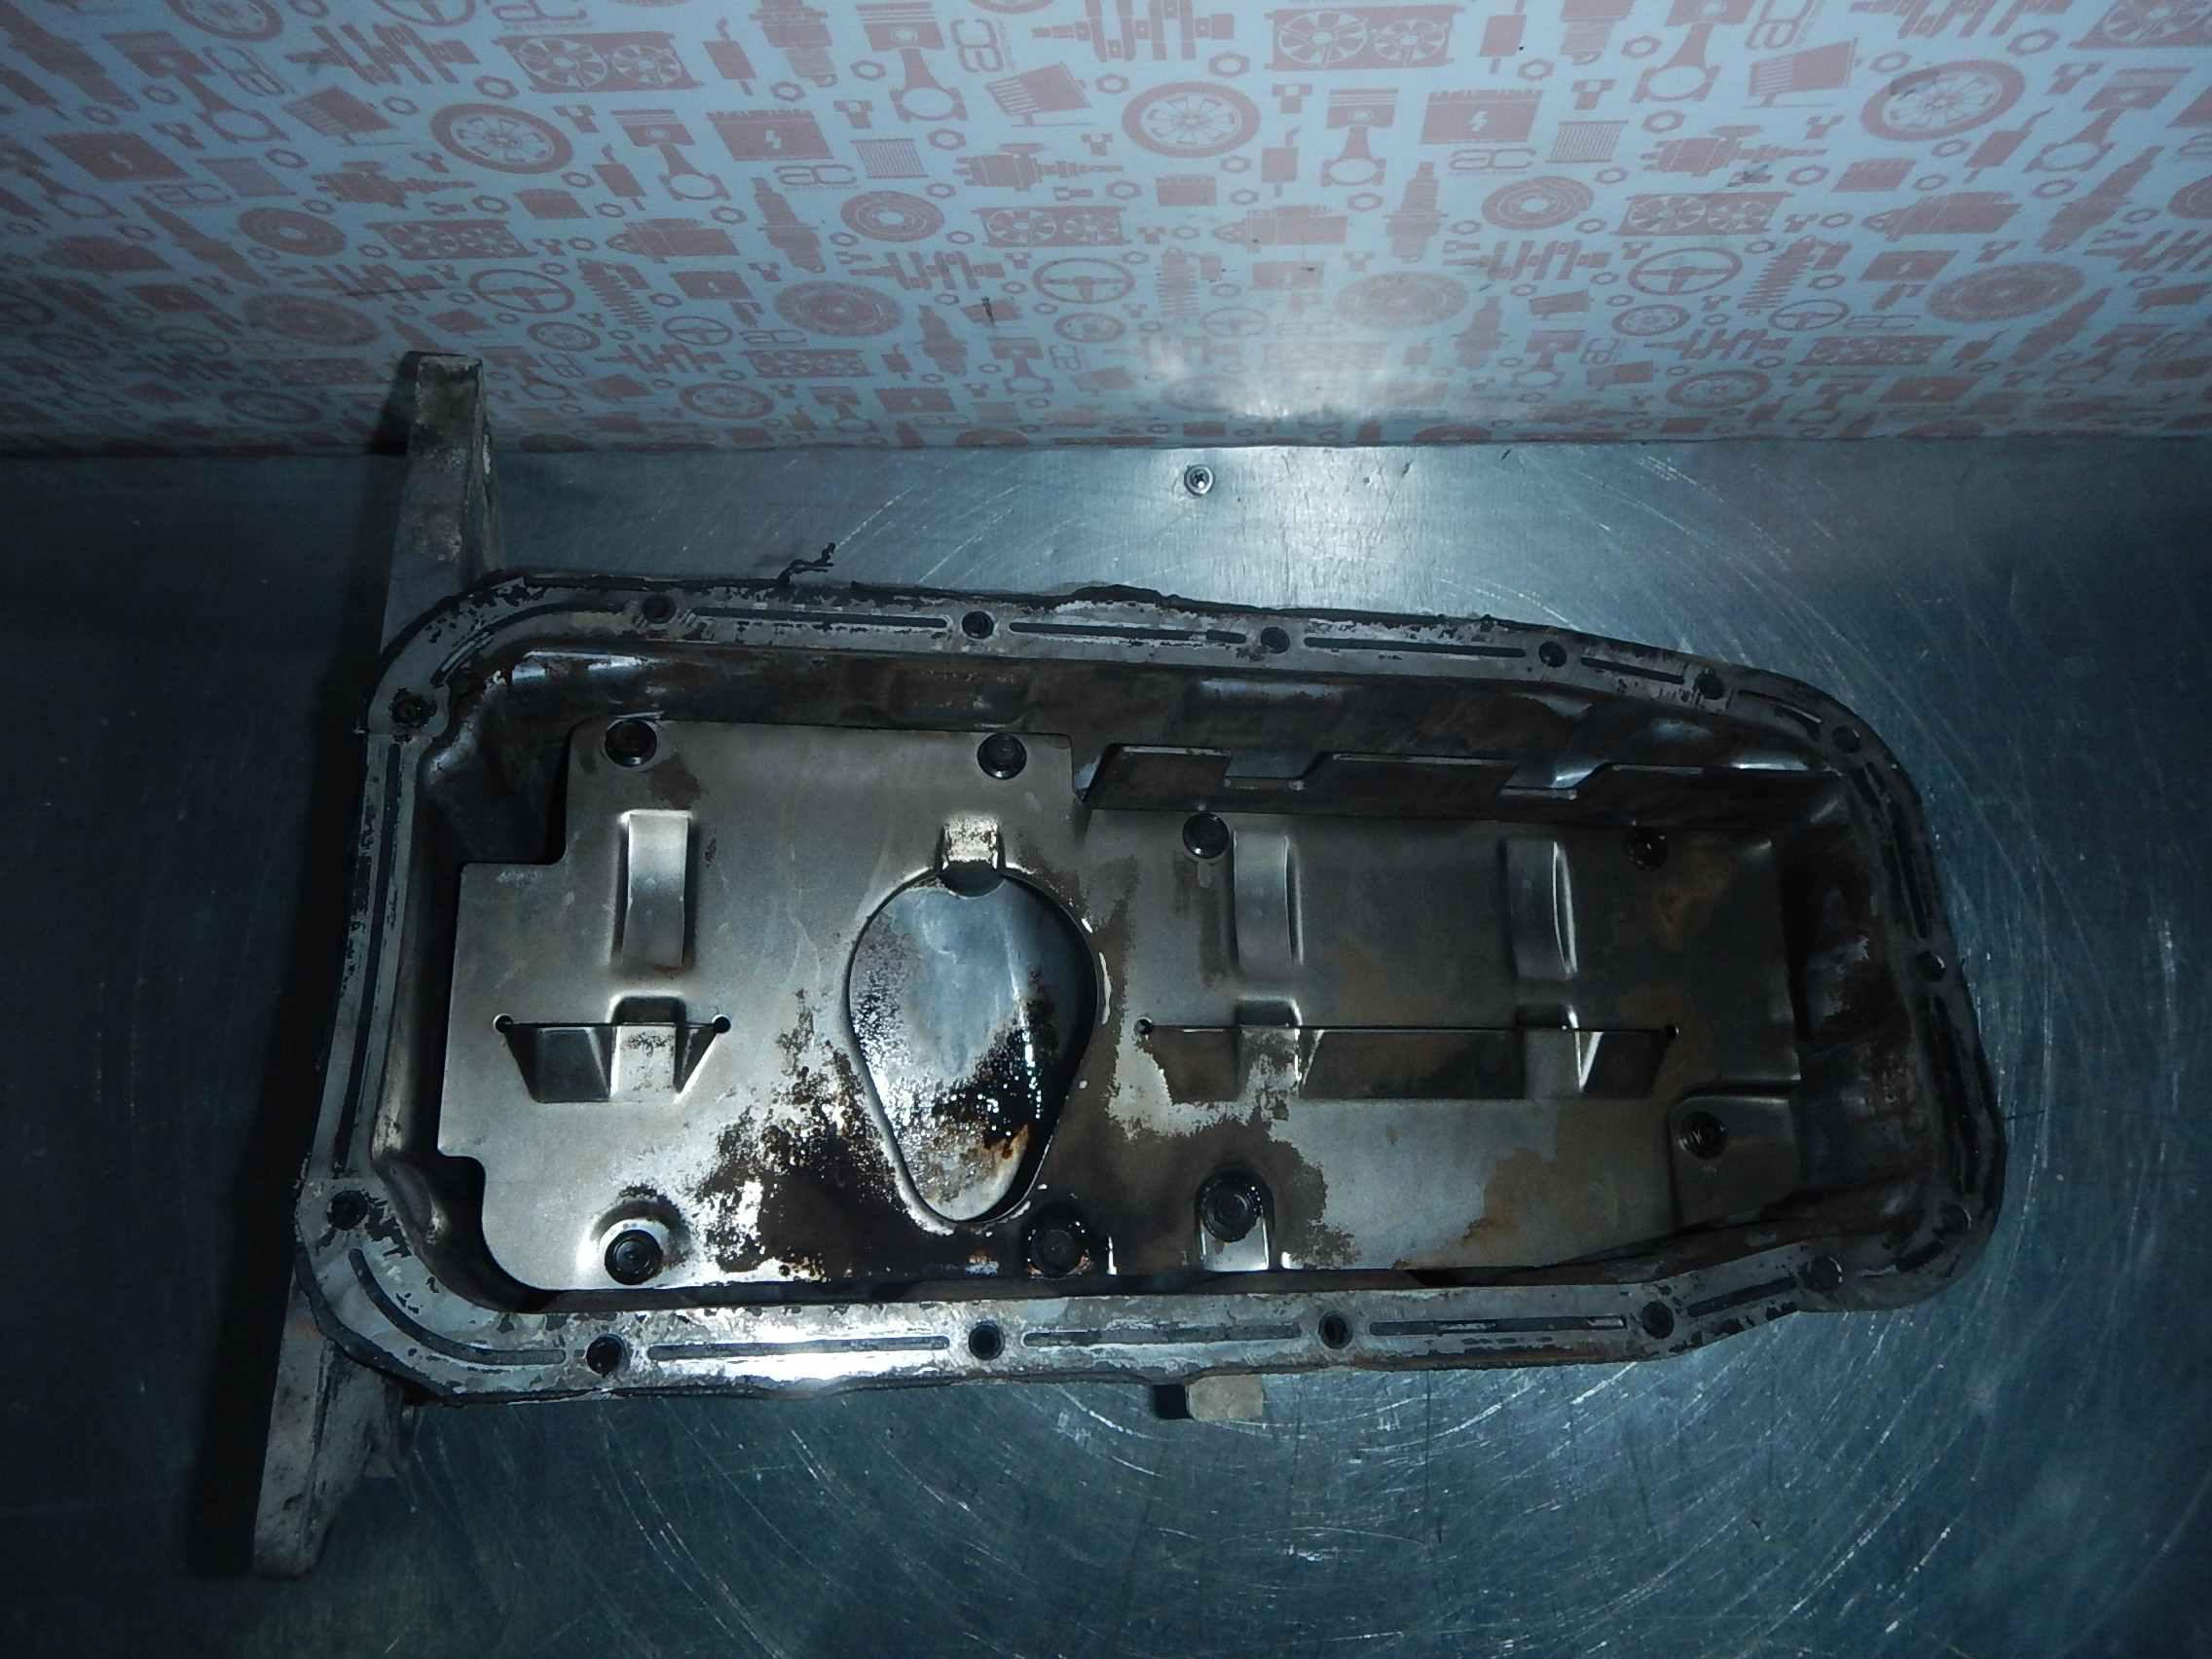 Поддон двигателя Daewoo Nubira 1 195830 preview-2